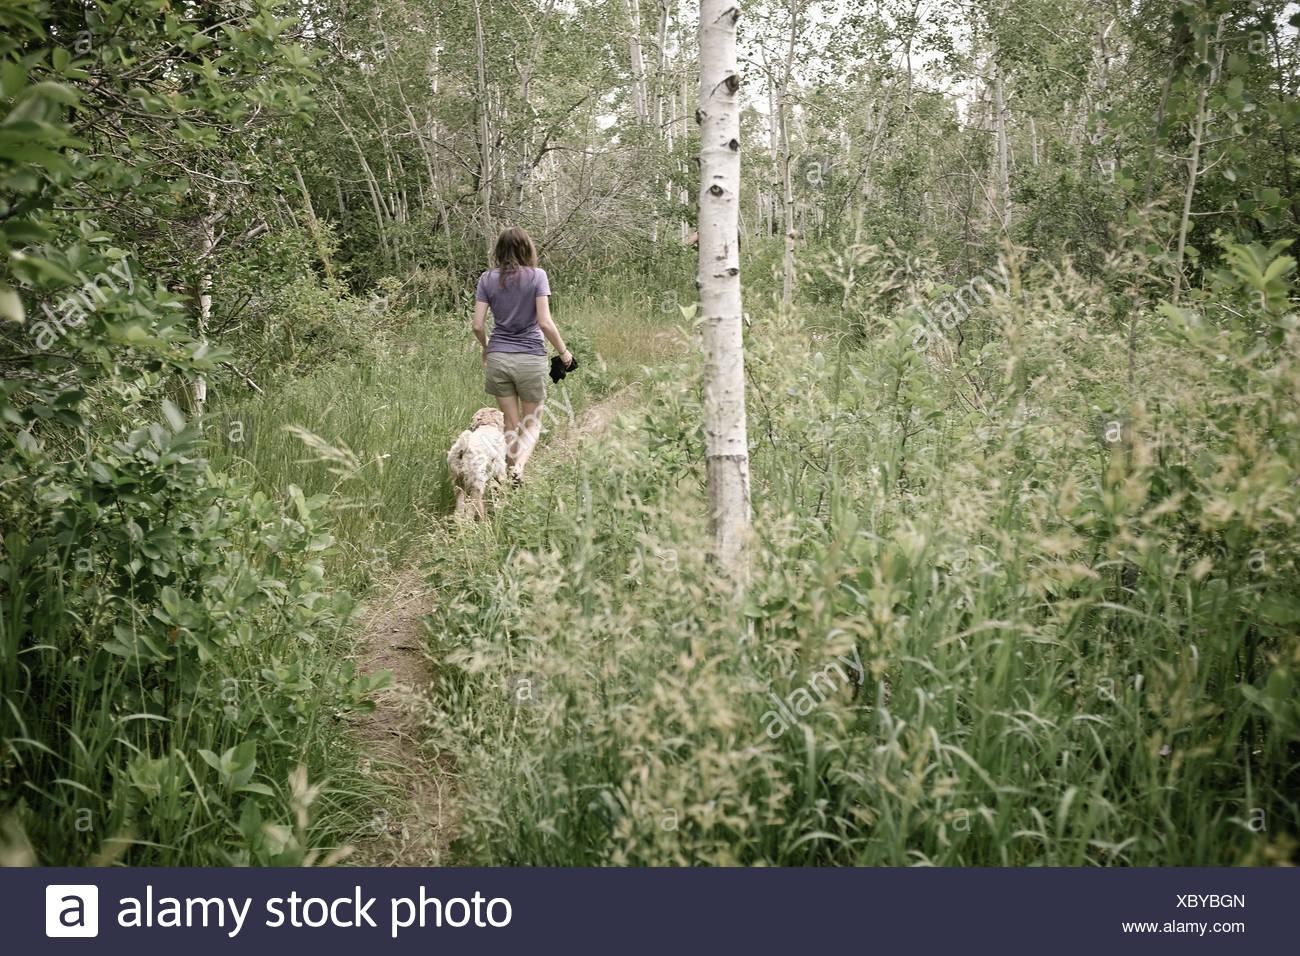 USA, Wyoming, Woman walking with dog - Stock Image